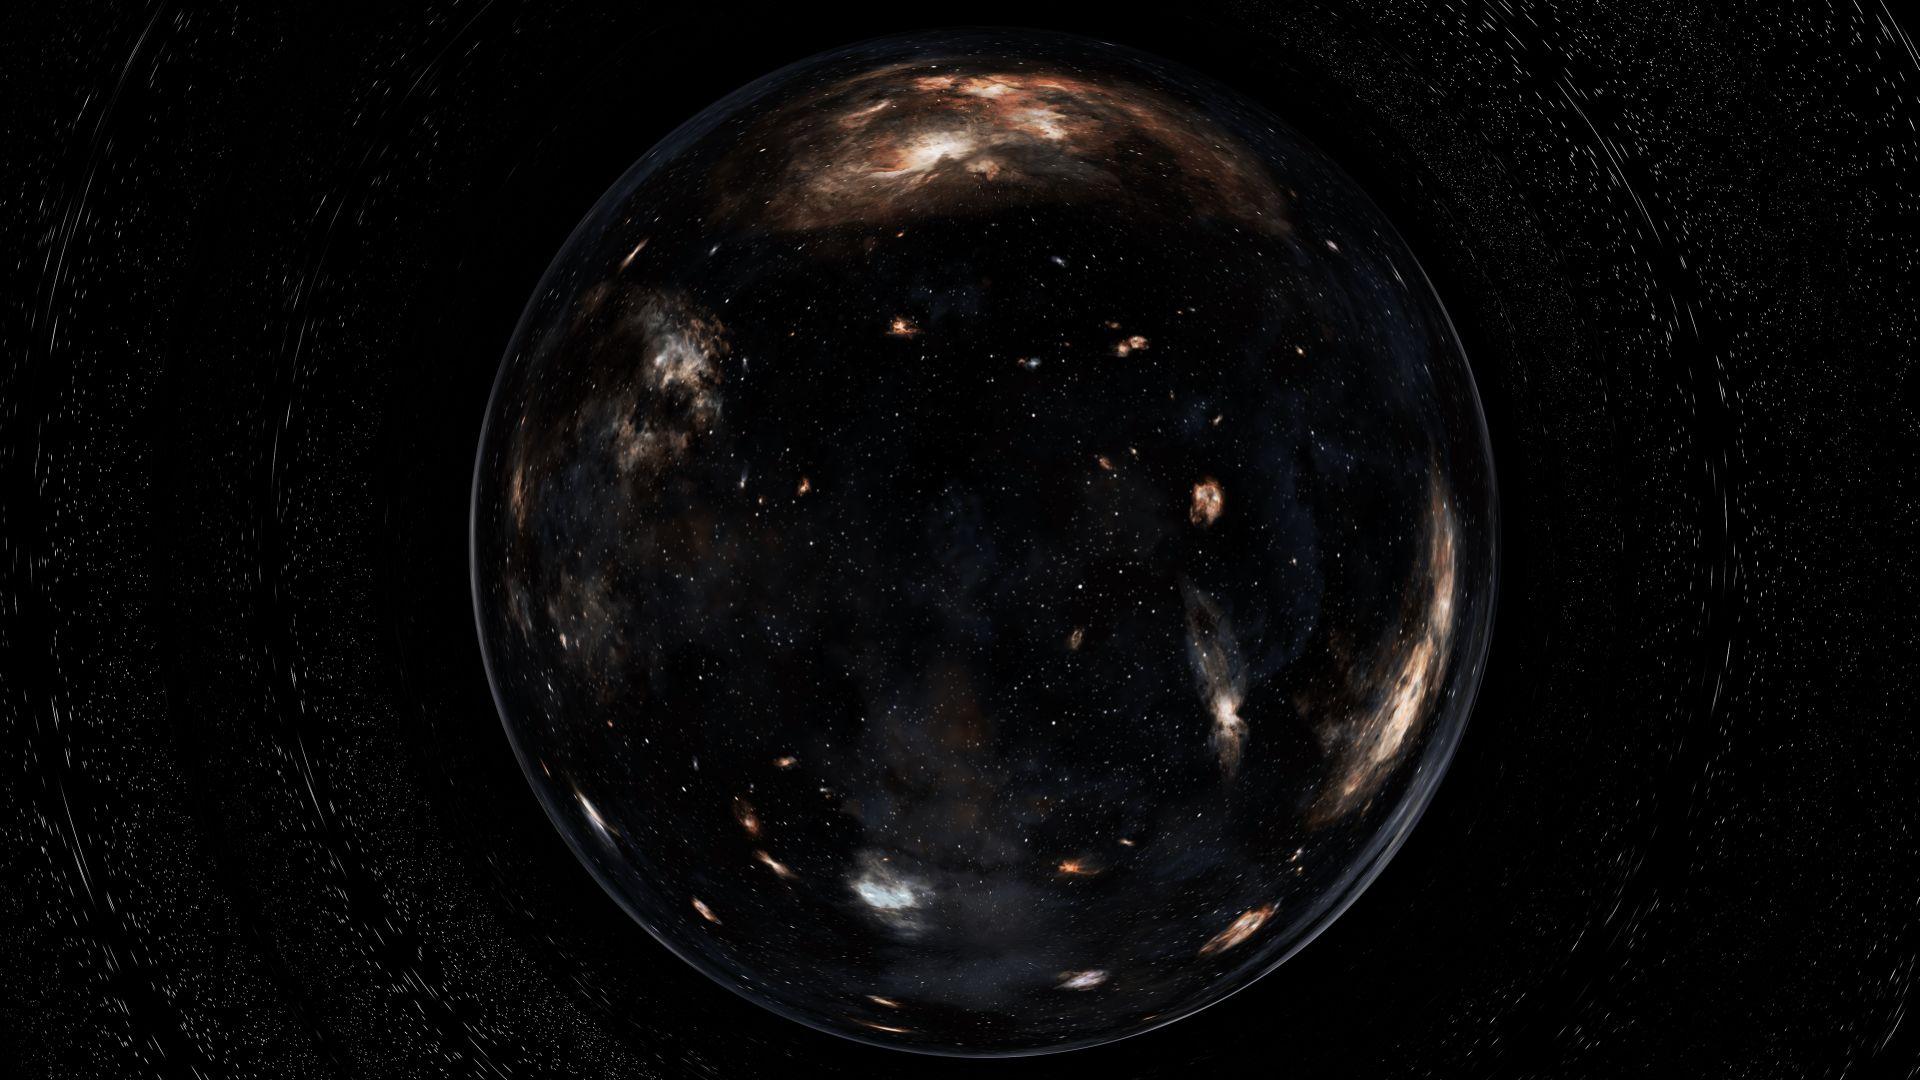 Black Hole Interstellar, PC Wallpaper